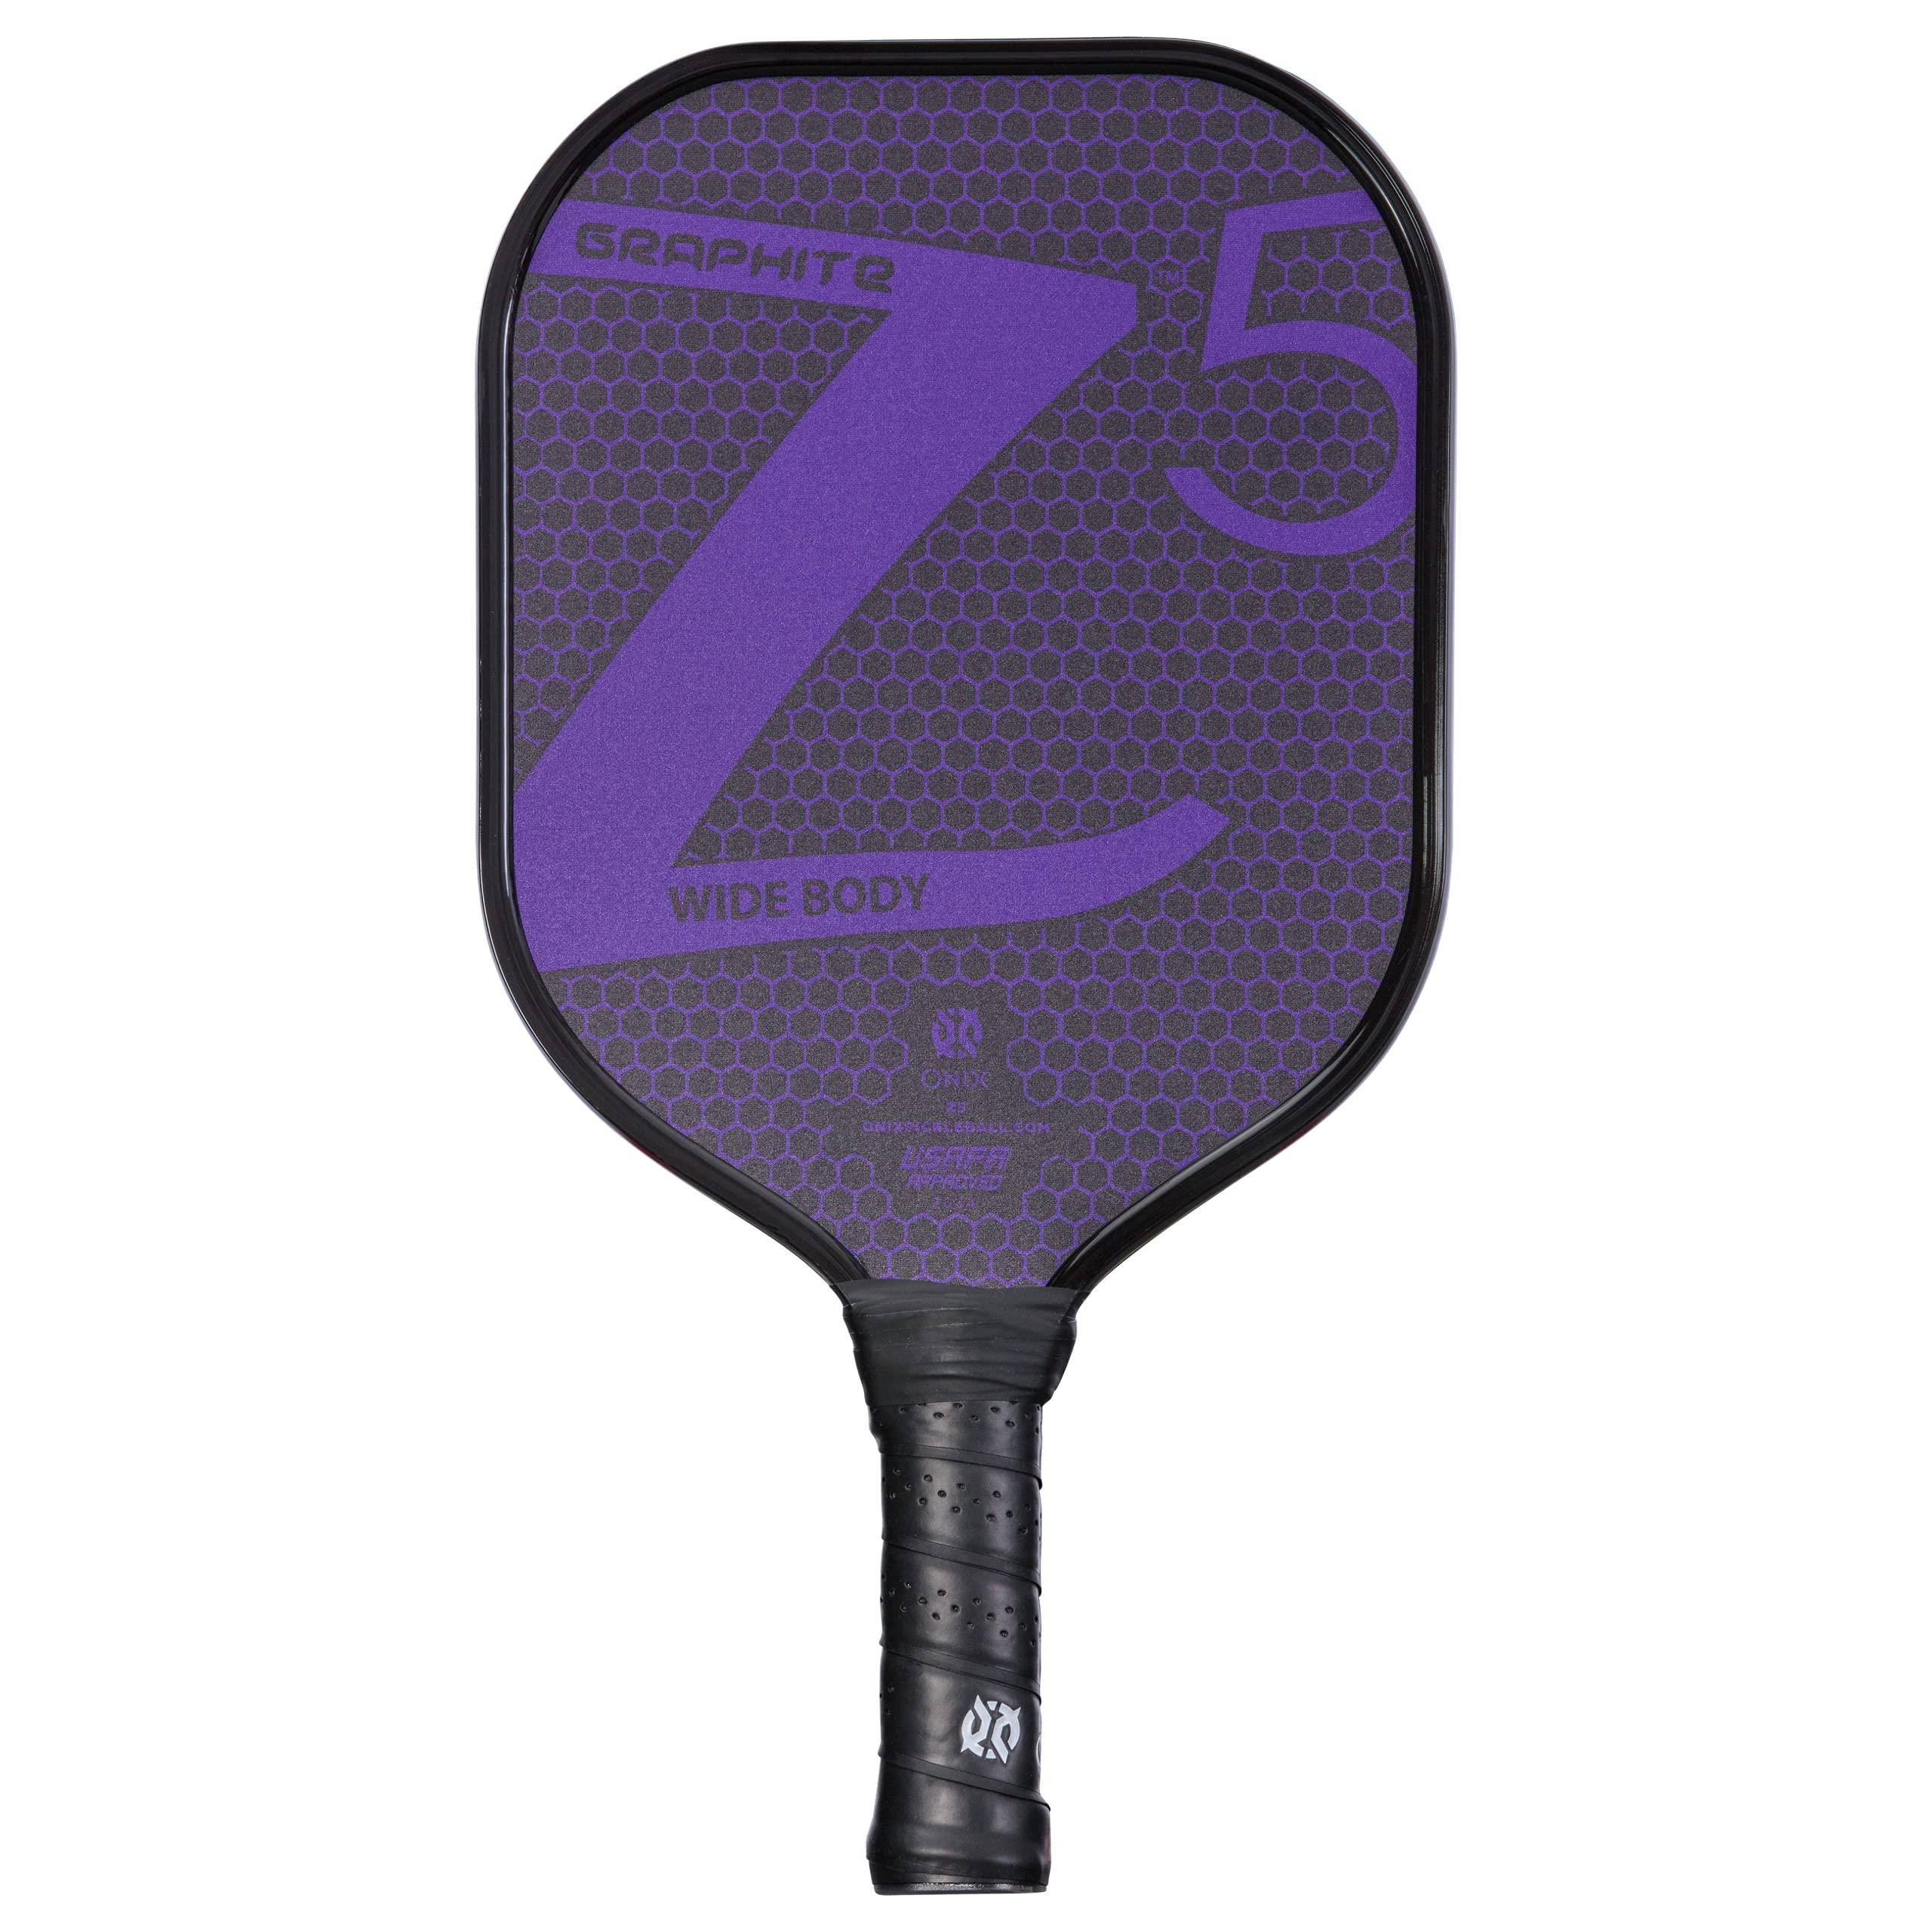 ONIX Graphite Z5 Graphite Carbon Fiber Pickleball Padd -OZZU